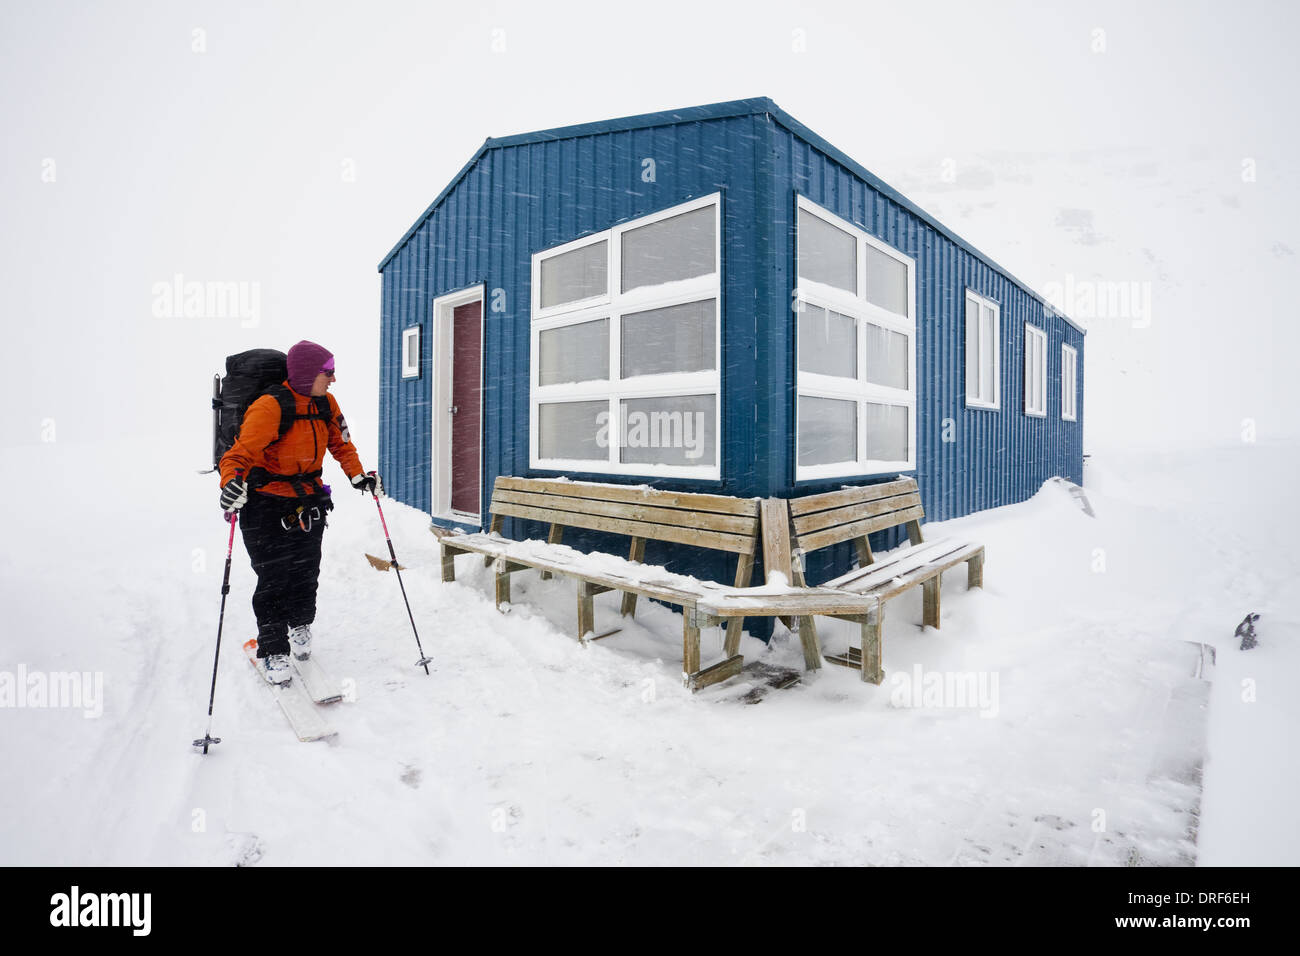 Alberta Canada. skier refuge hut Wapta Traverse mountain ski tour - Stock Image